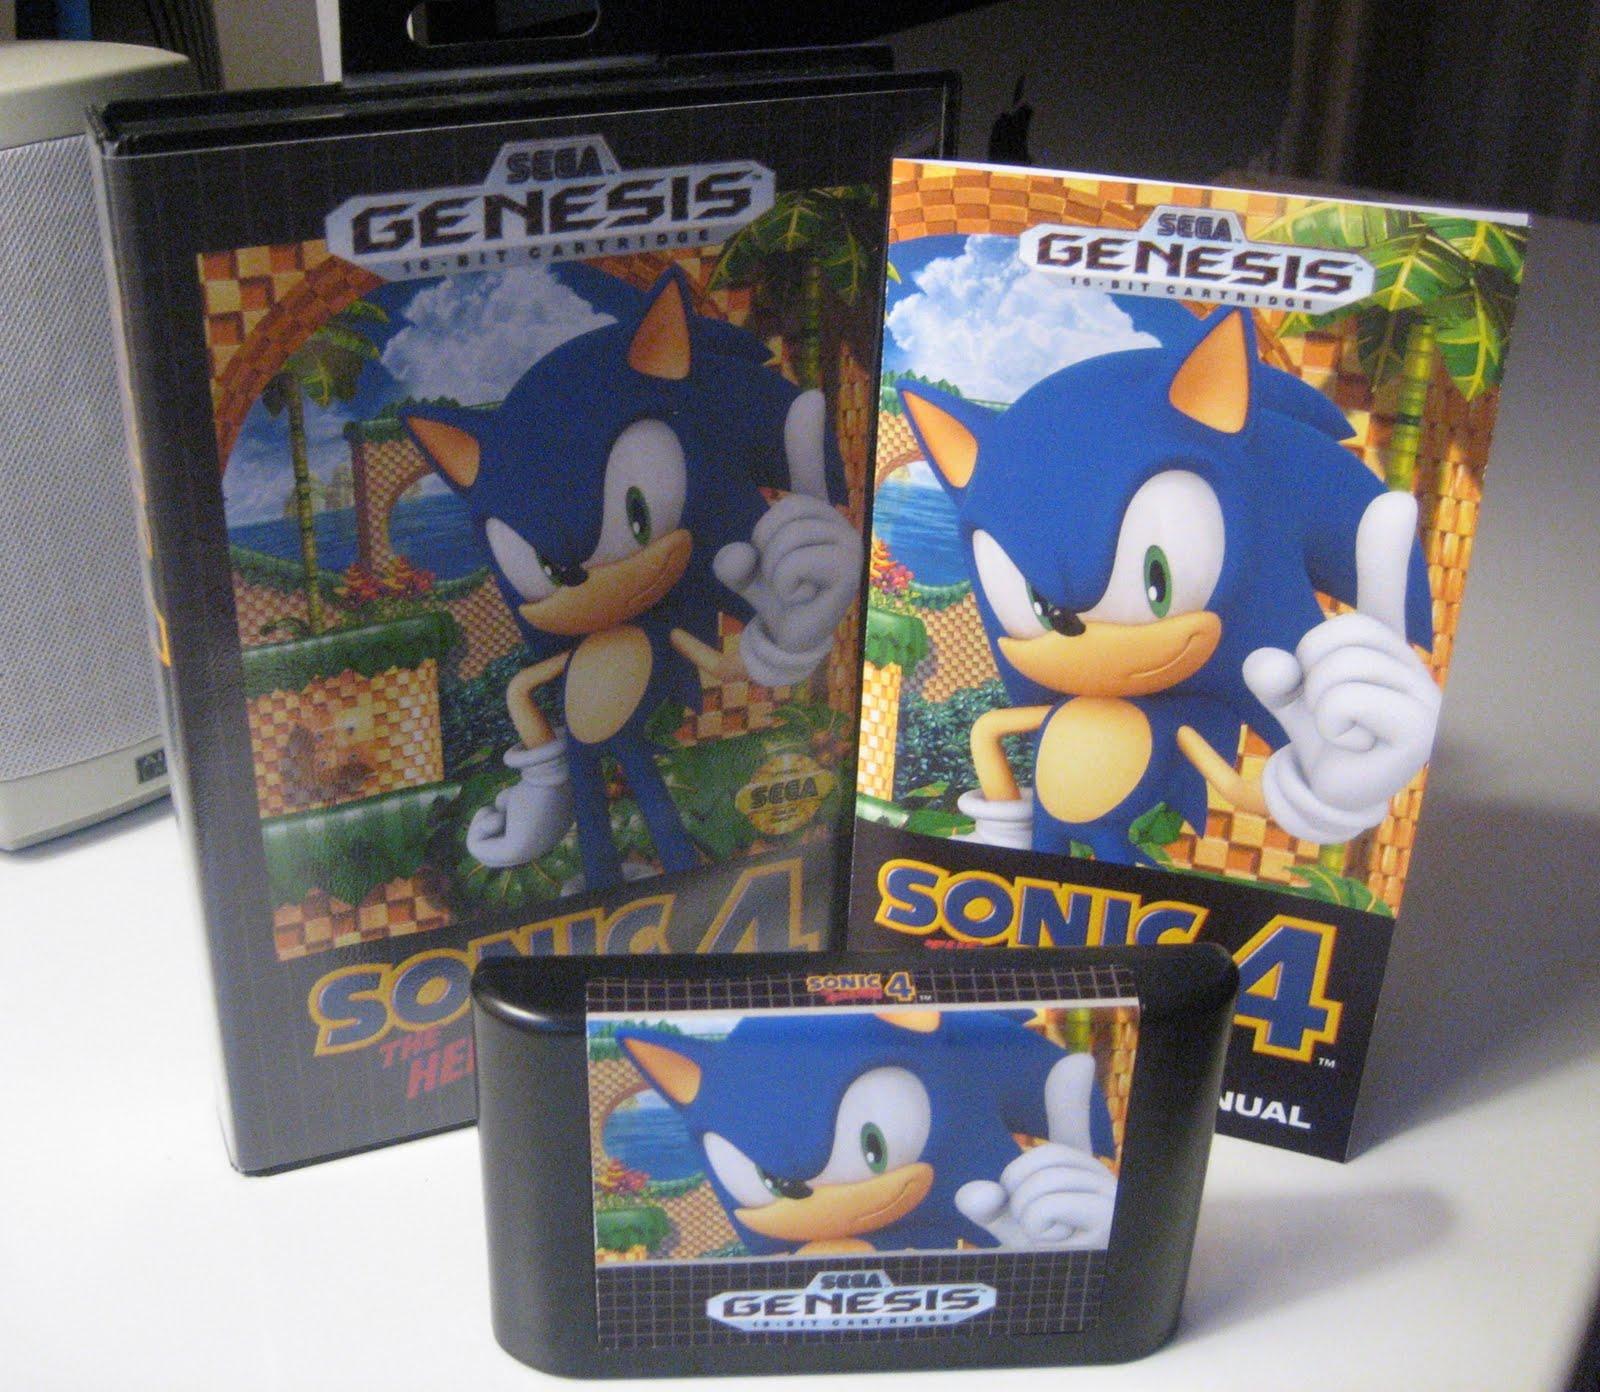 Sonic_4_Genesis_art